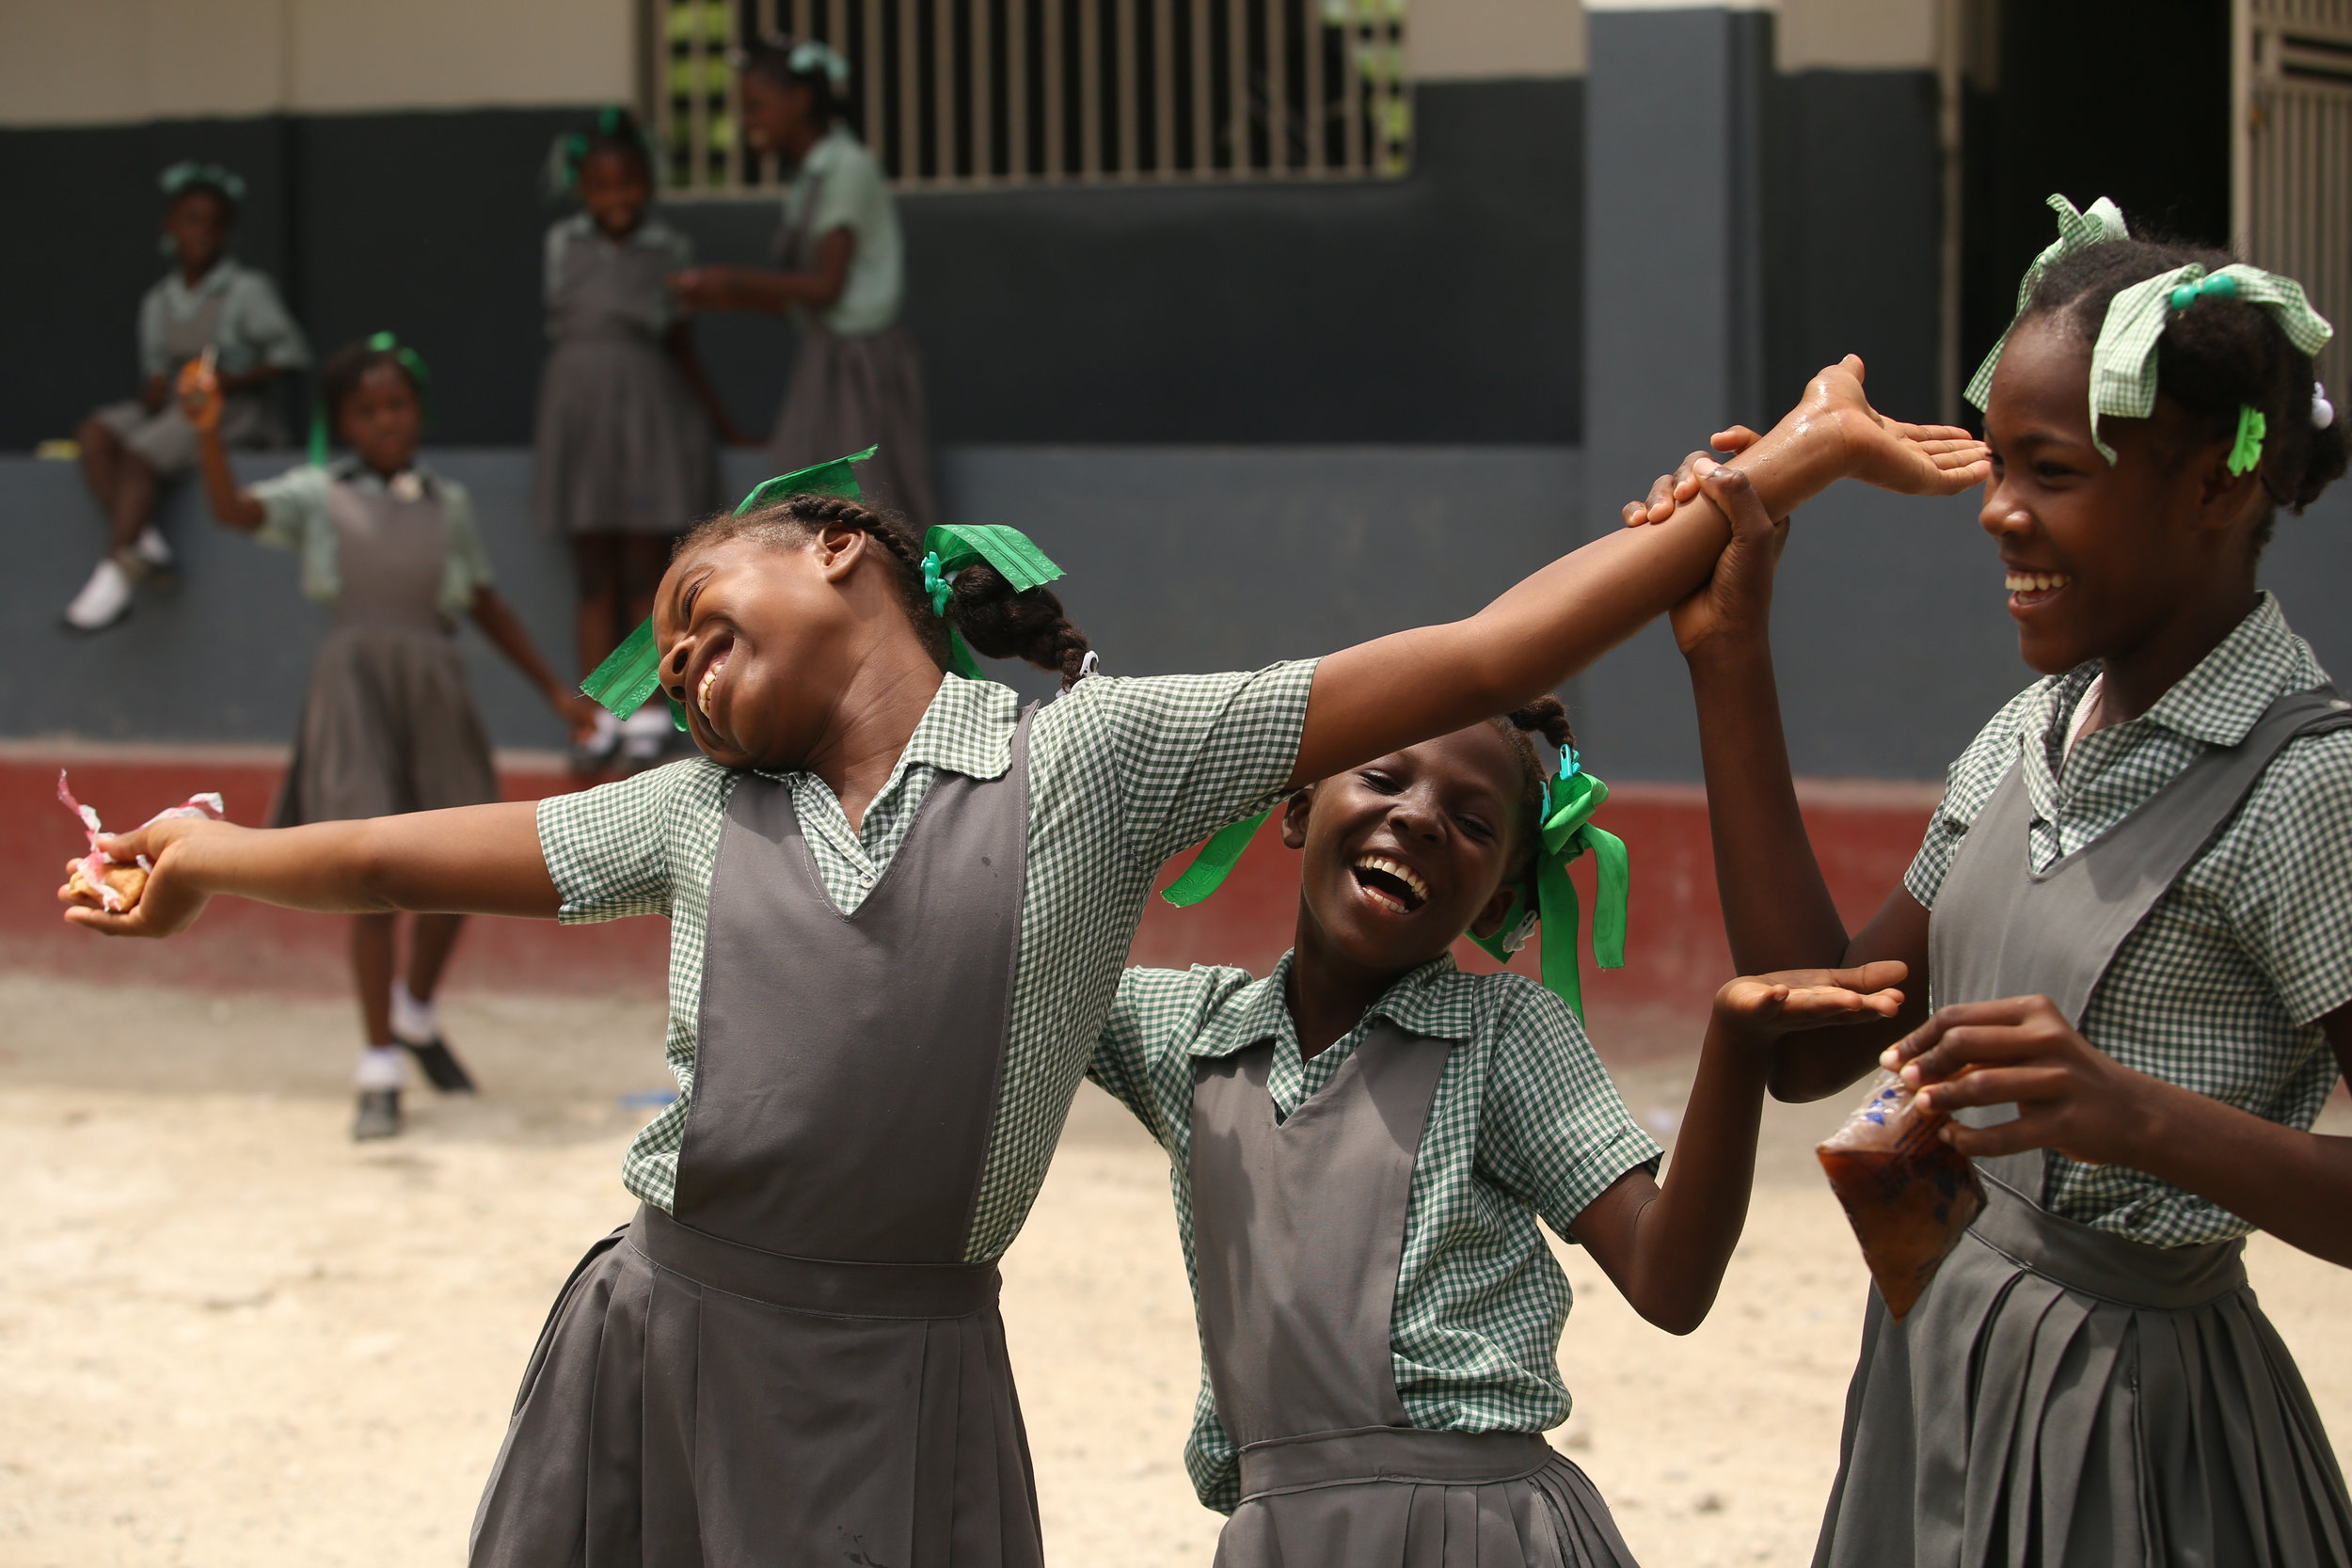 haiti students dancing.jpg